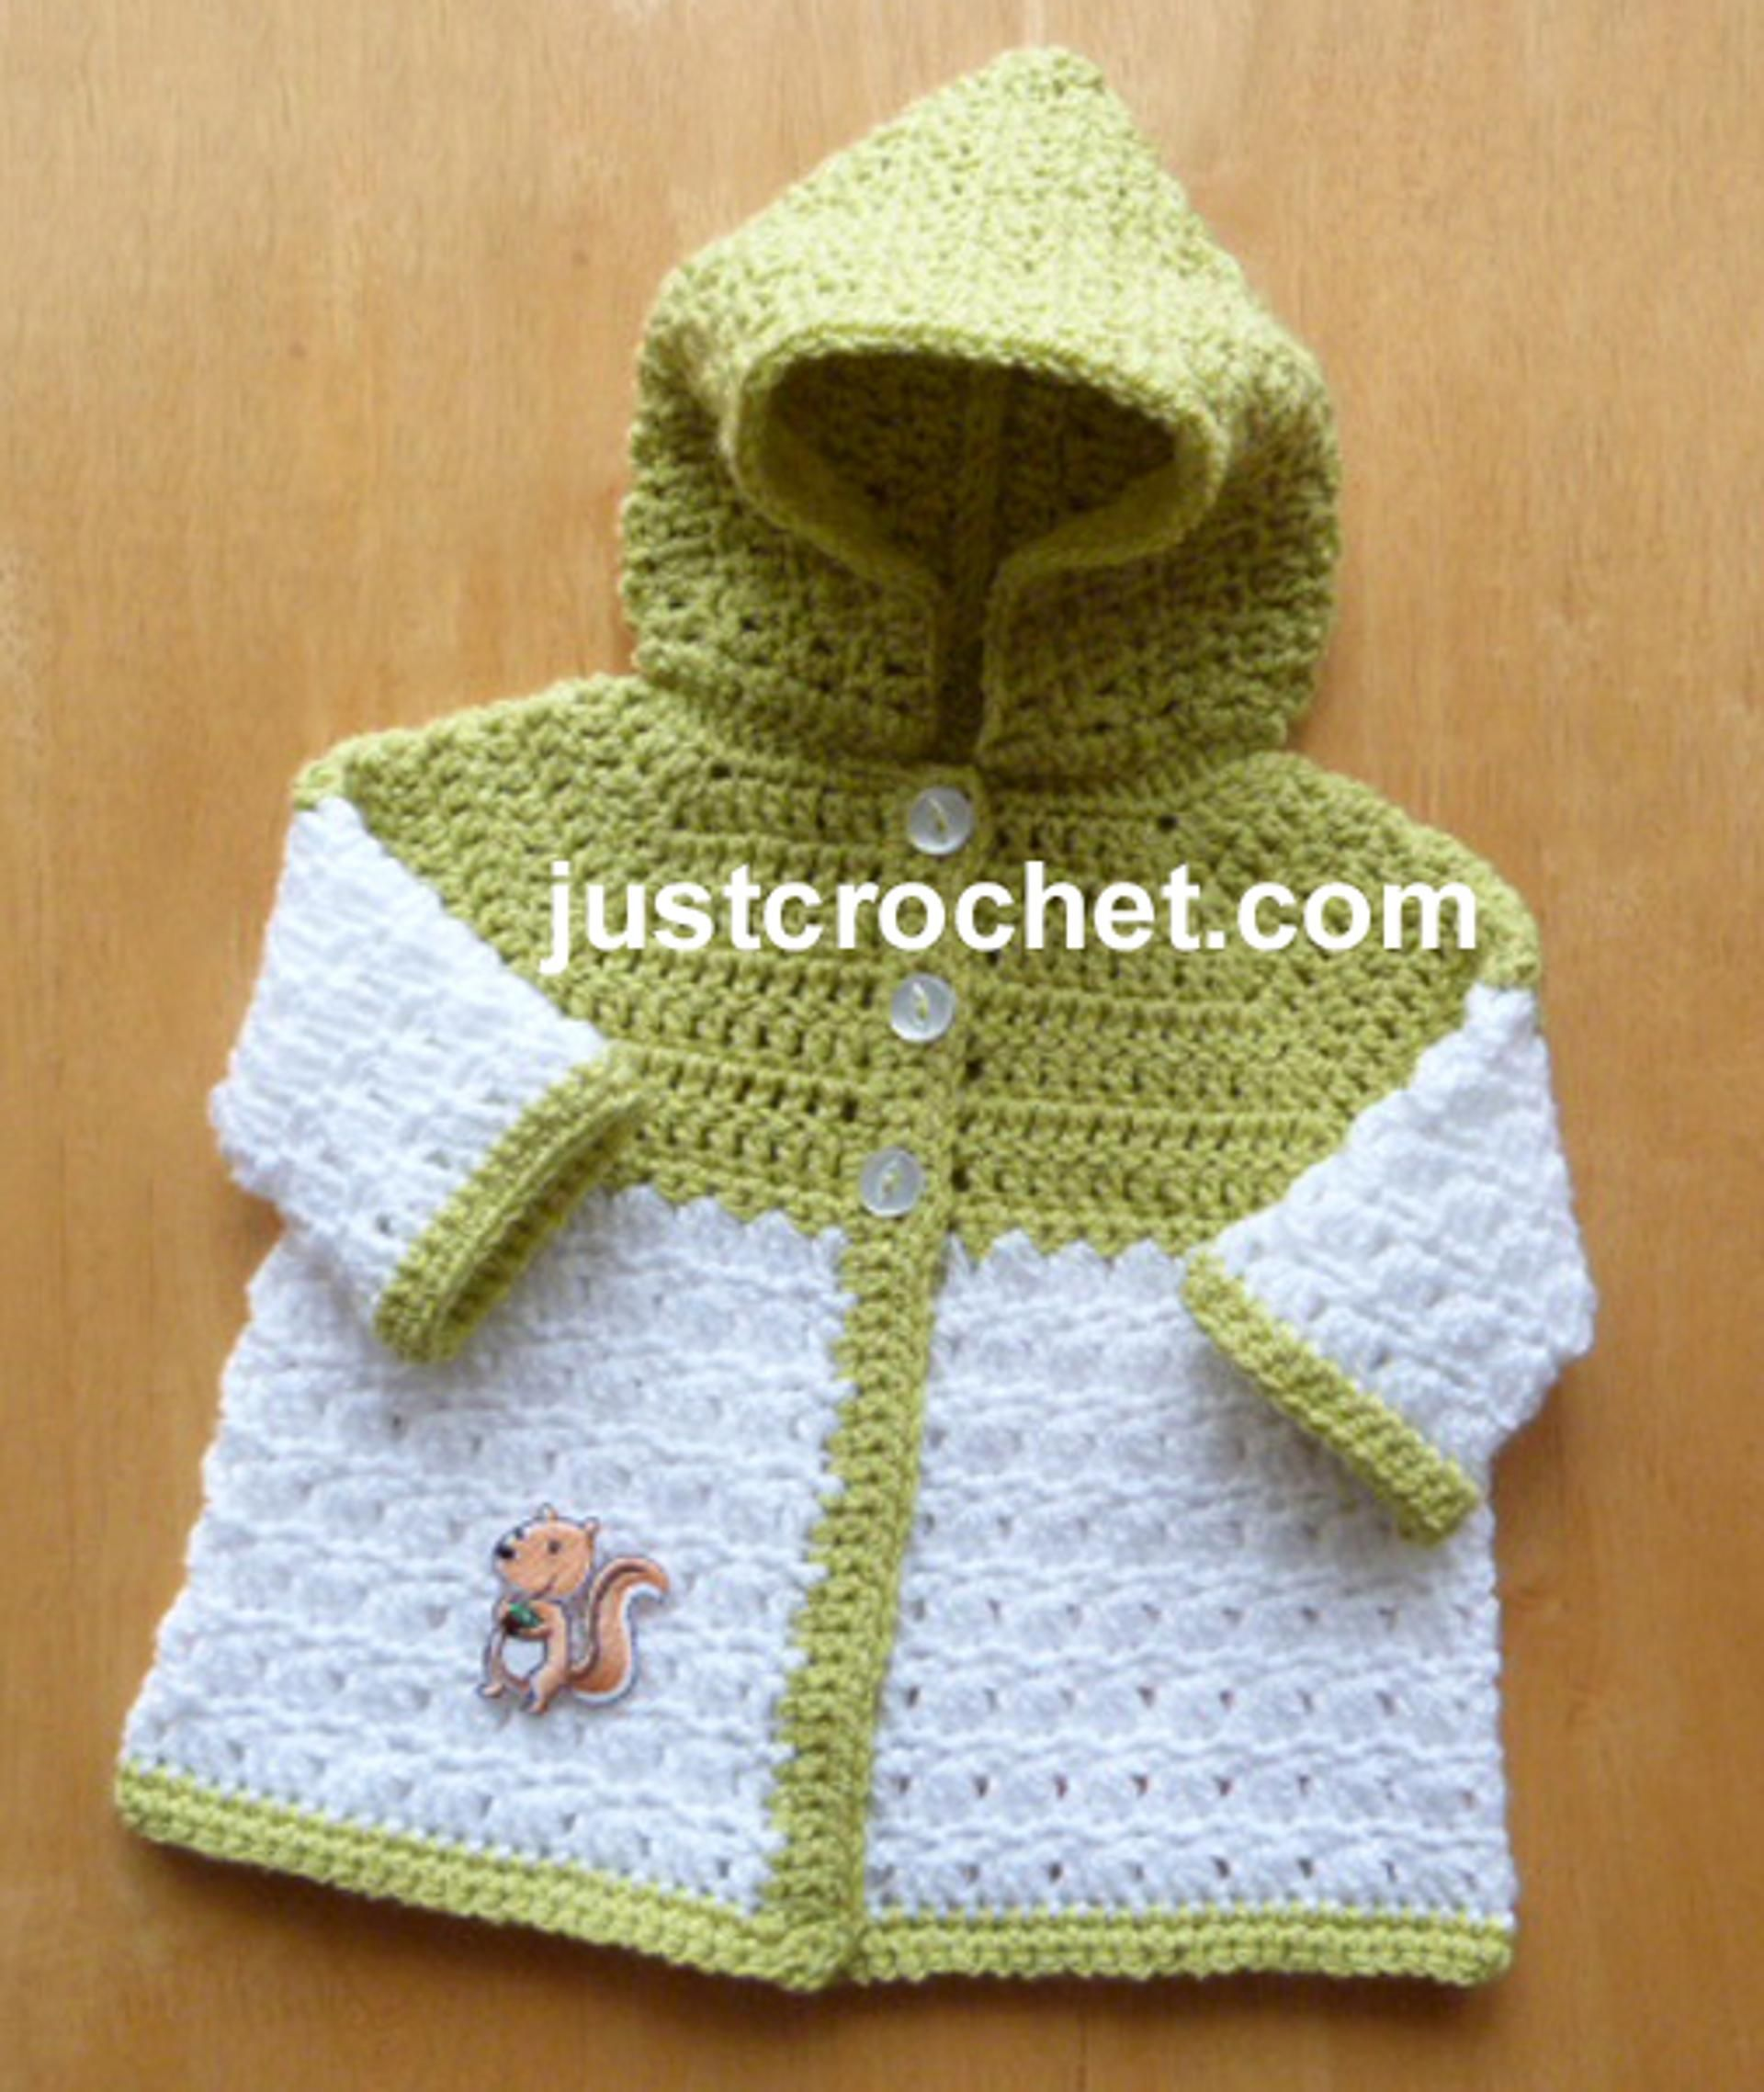 fjc124-Newborn Hooded Coat Baby Crochet Pattern | Craftsy